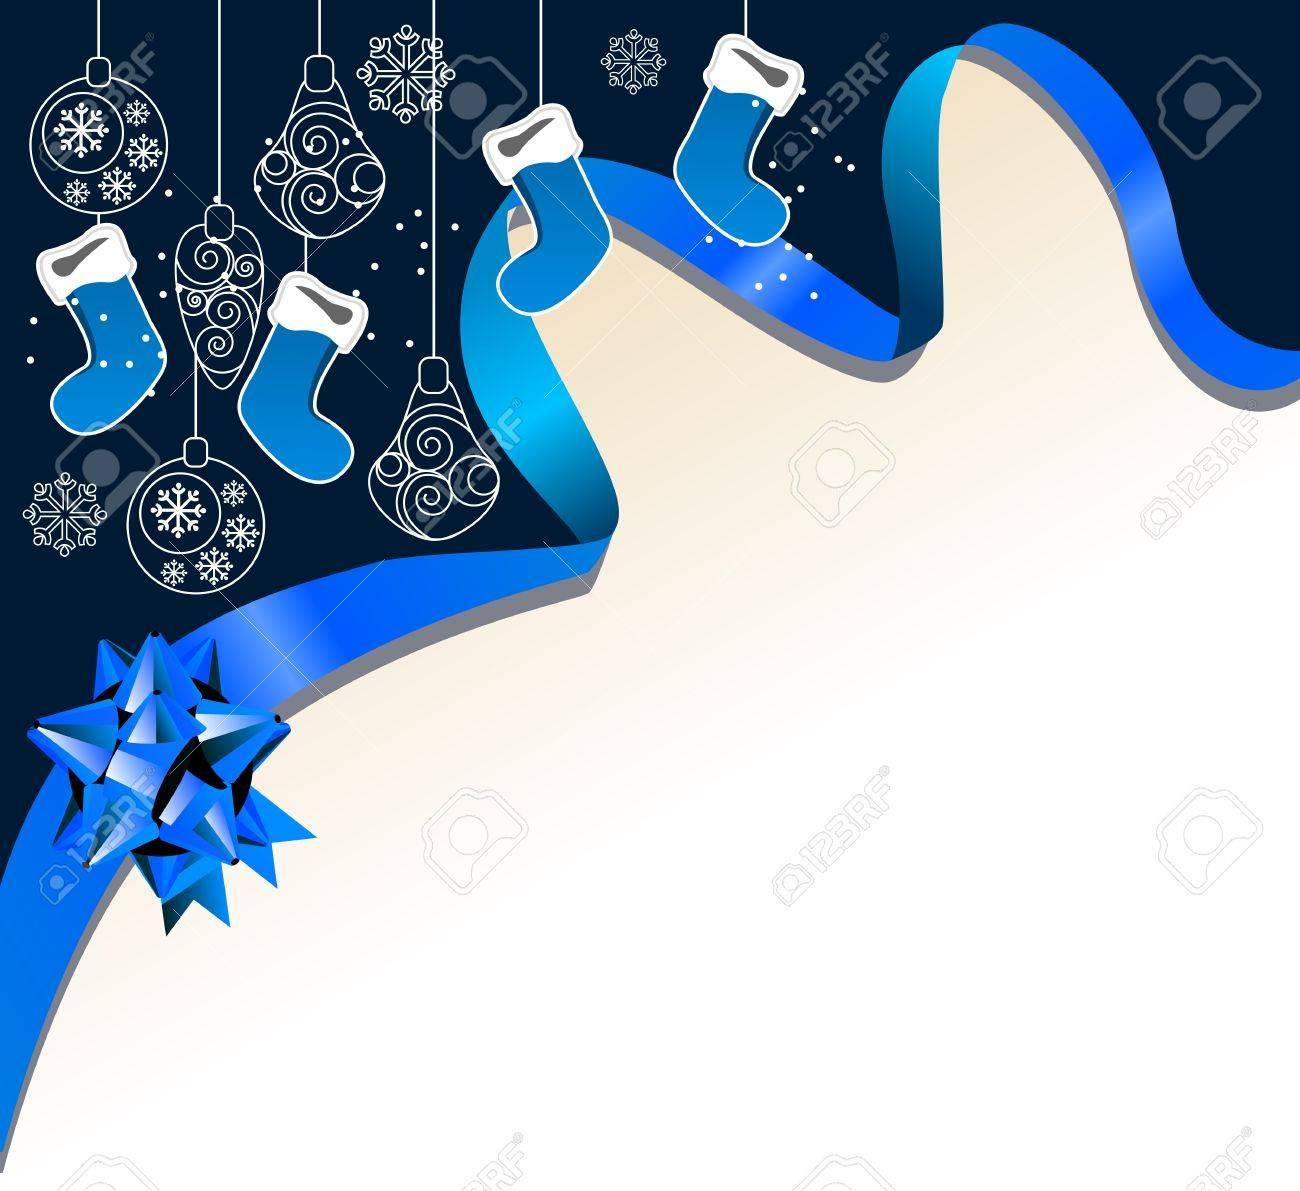 Christmas background with handing Santa socks Stock Vector - 11464639